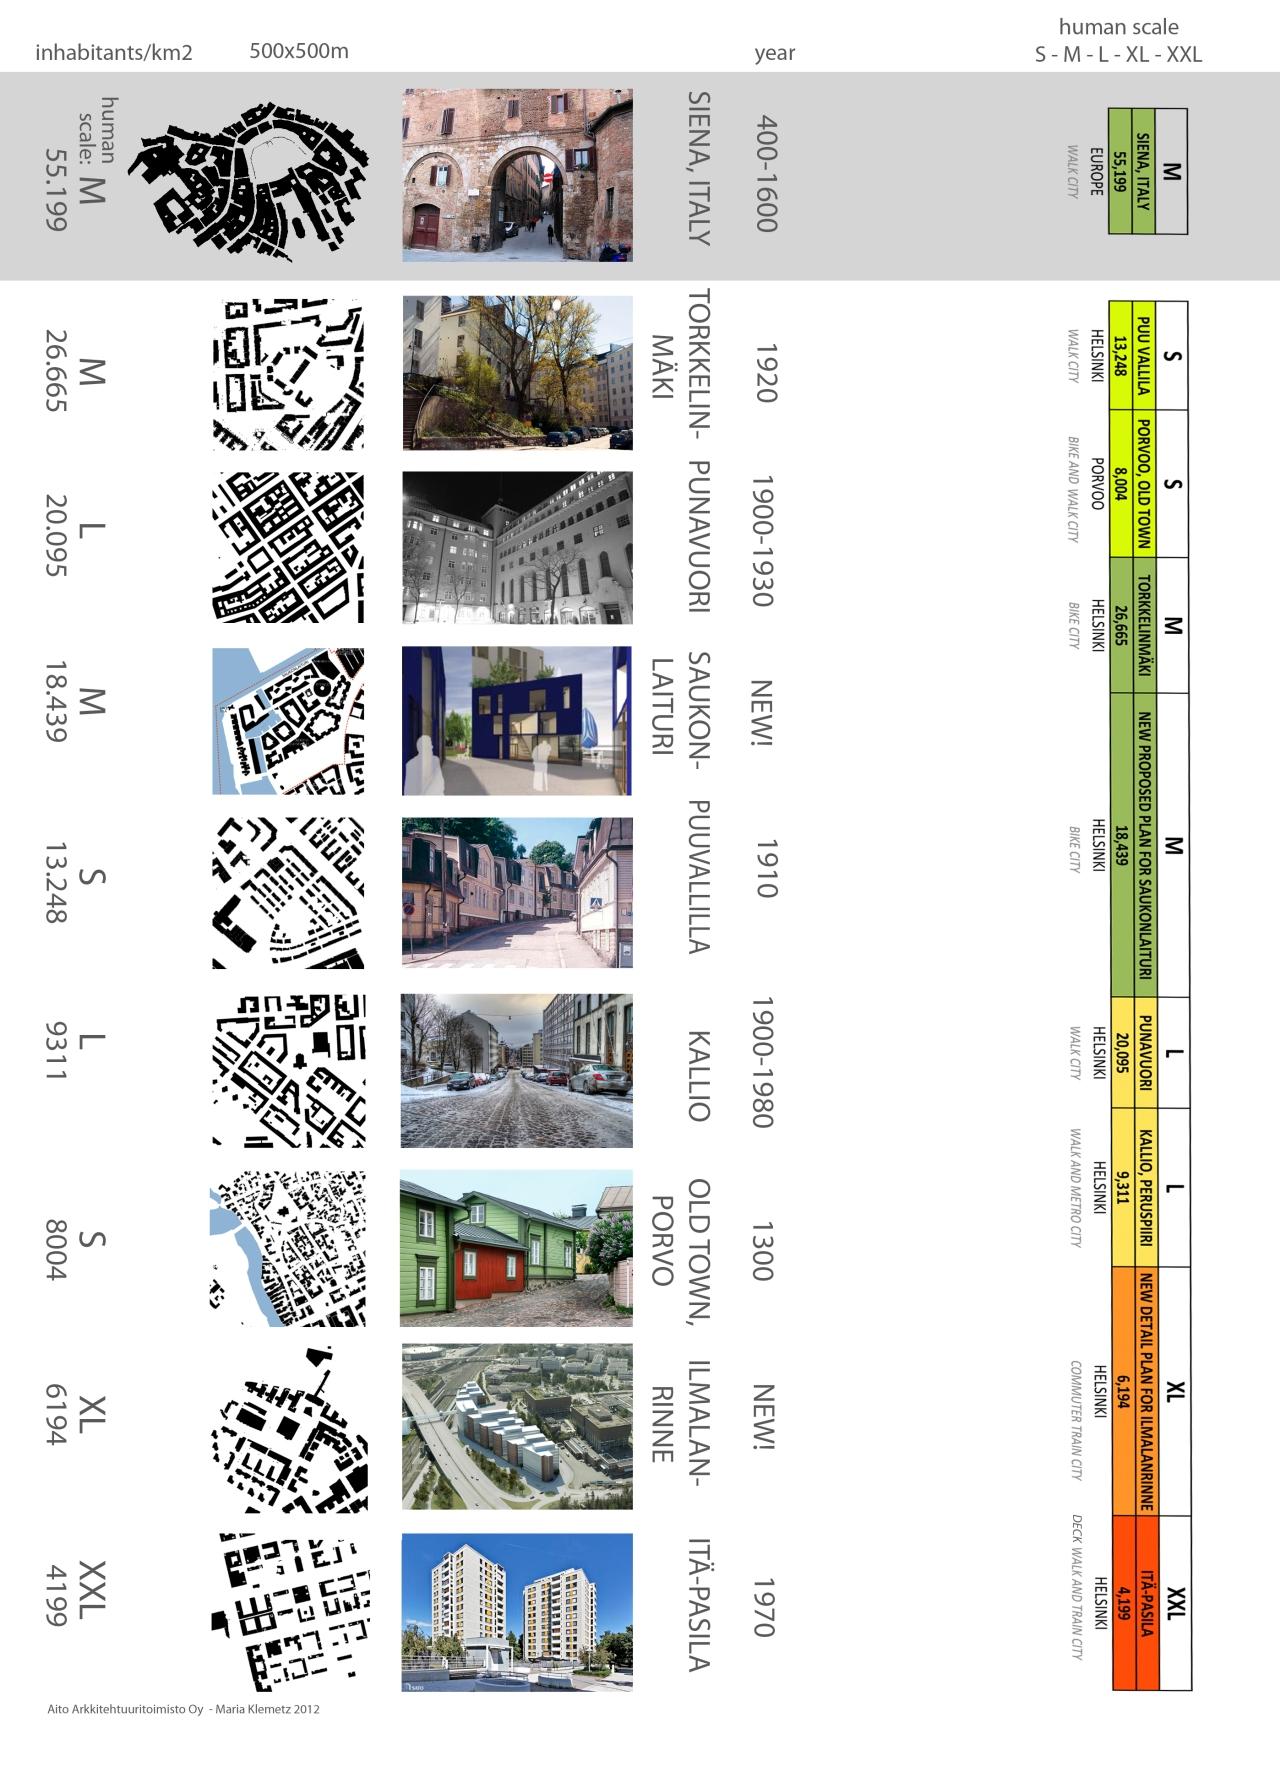 Density and scale urban comparison